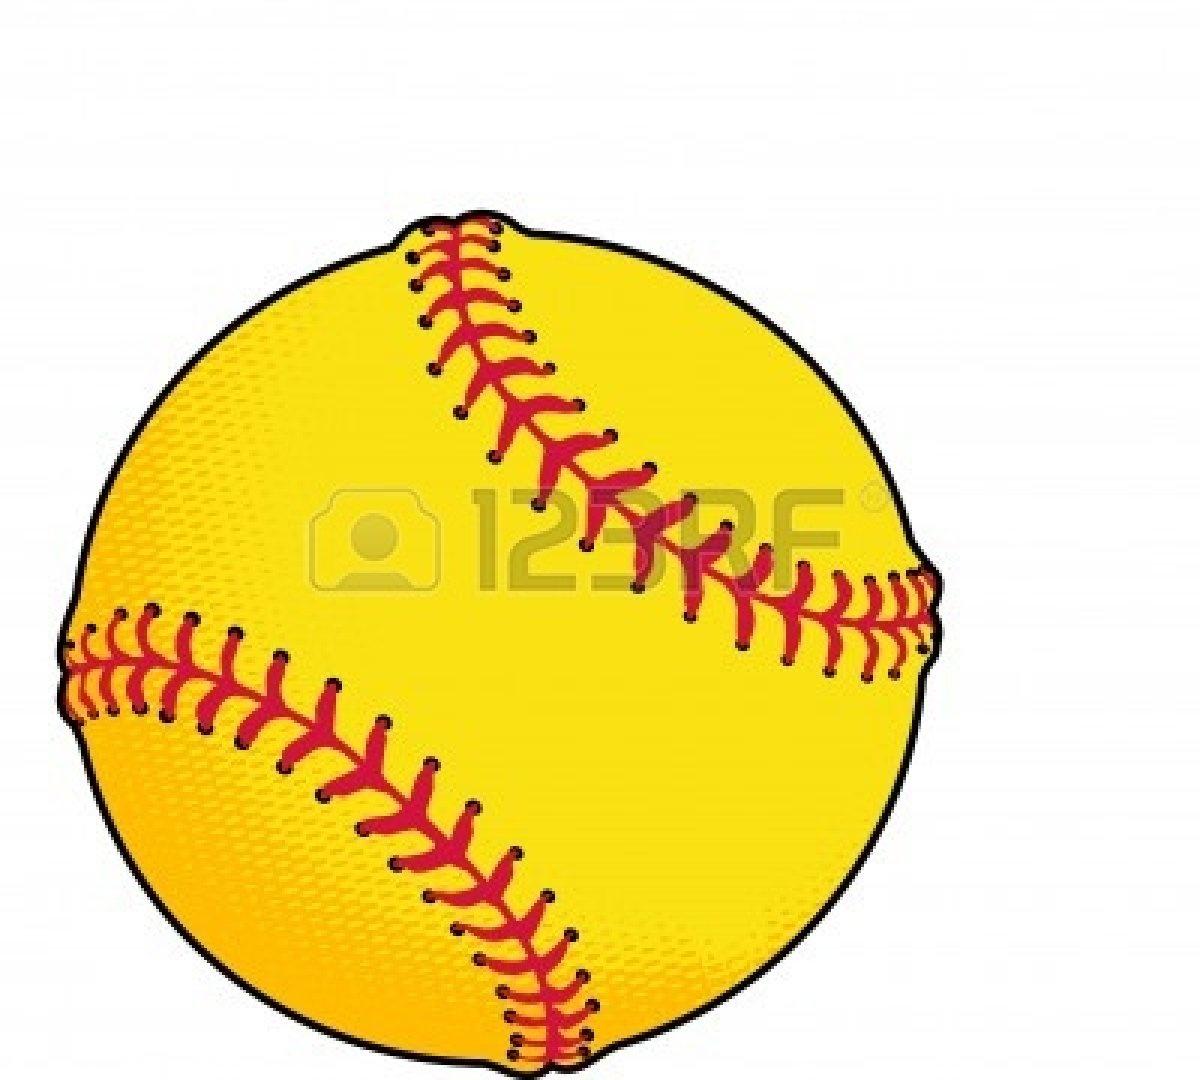 Softball Clipart | Free Download Best Softball Clipart On Clipartmag - Free Printable Softball Pictures